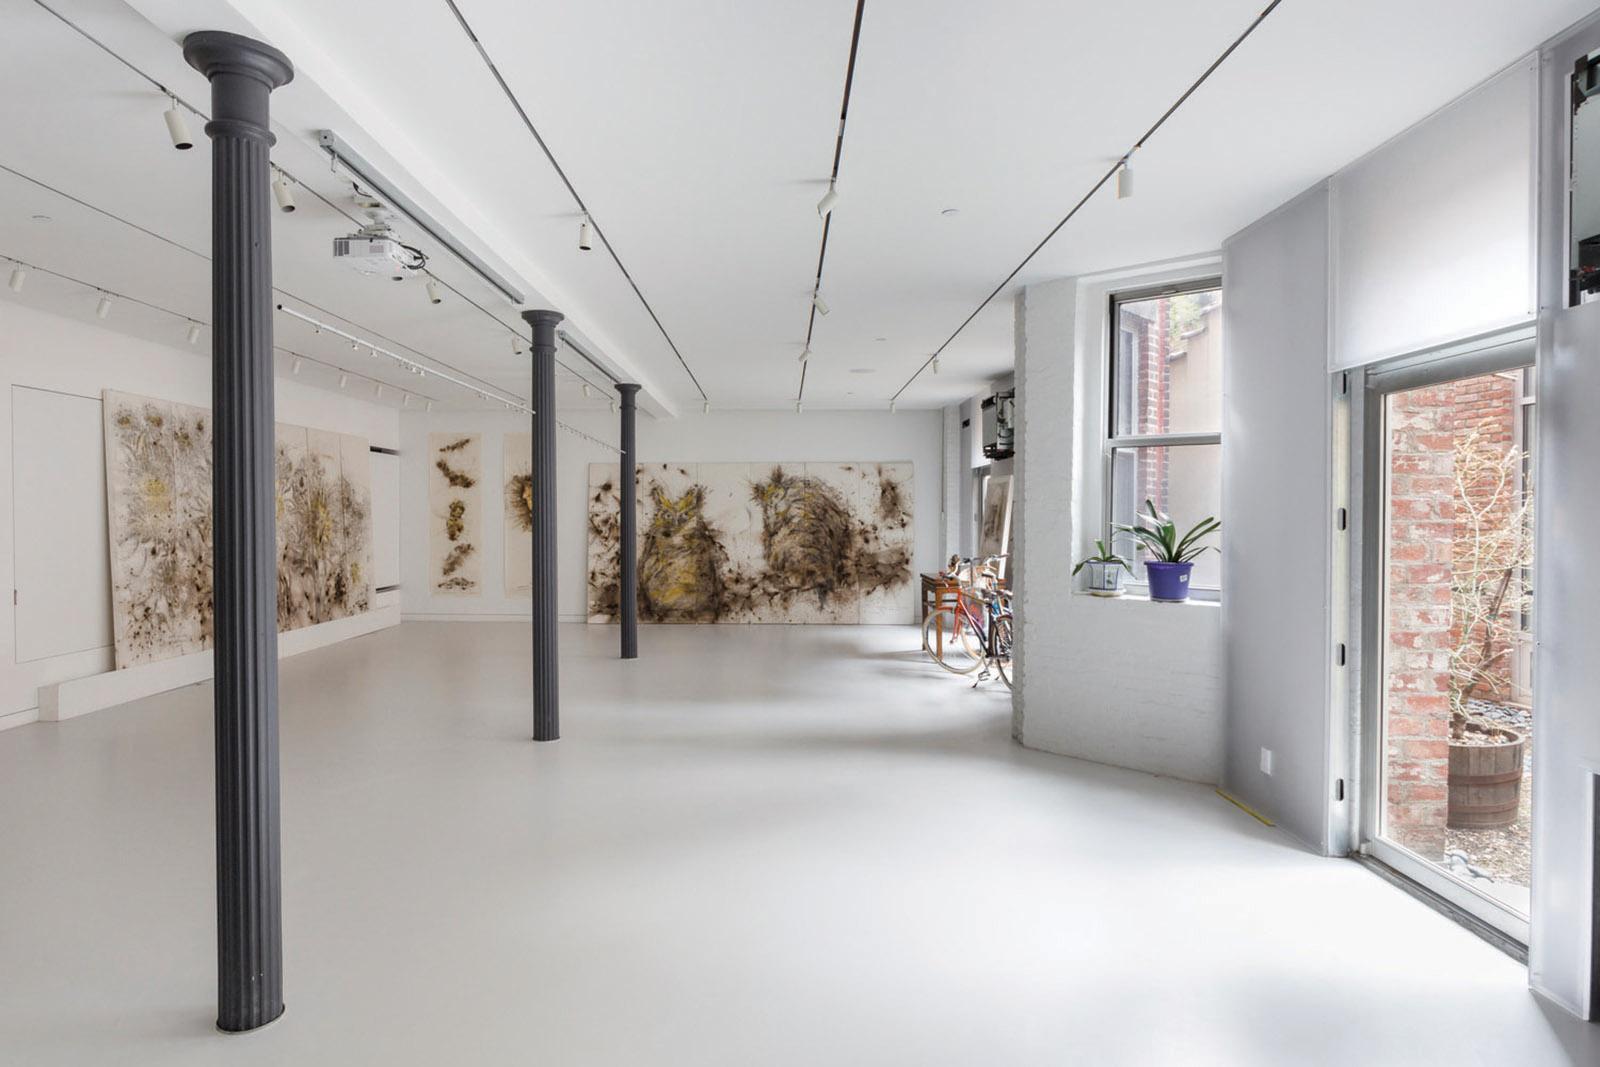 02_Cai Guo Qiang Studio-west-atelier.jpg